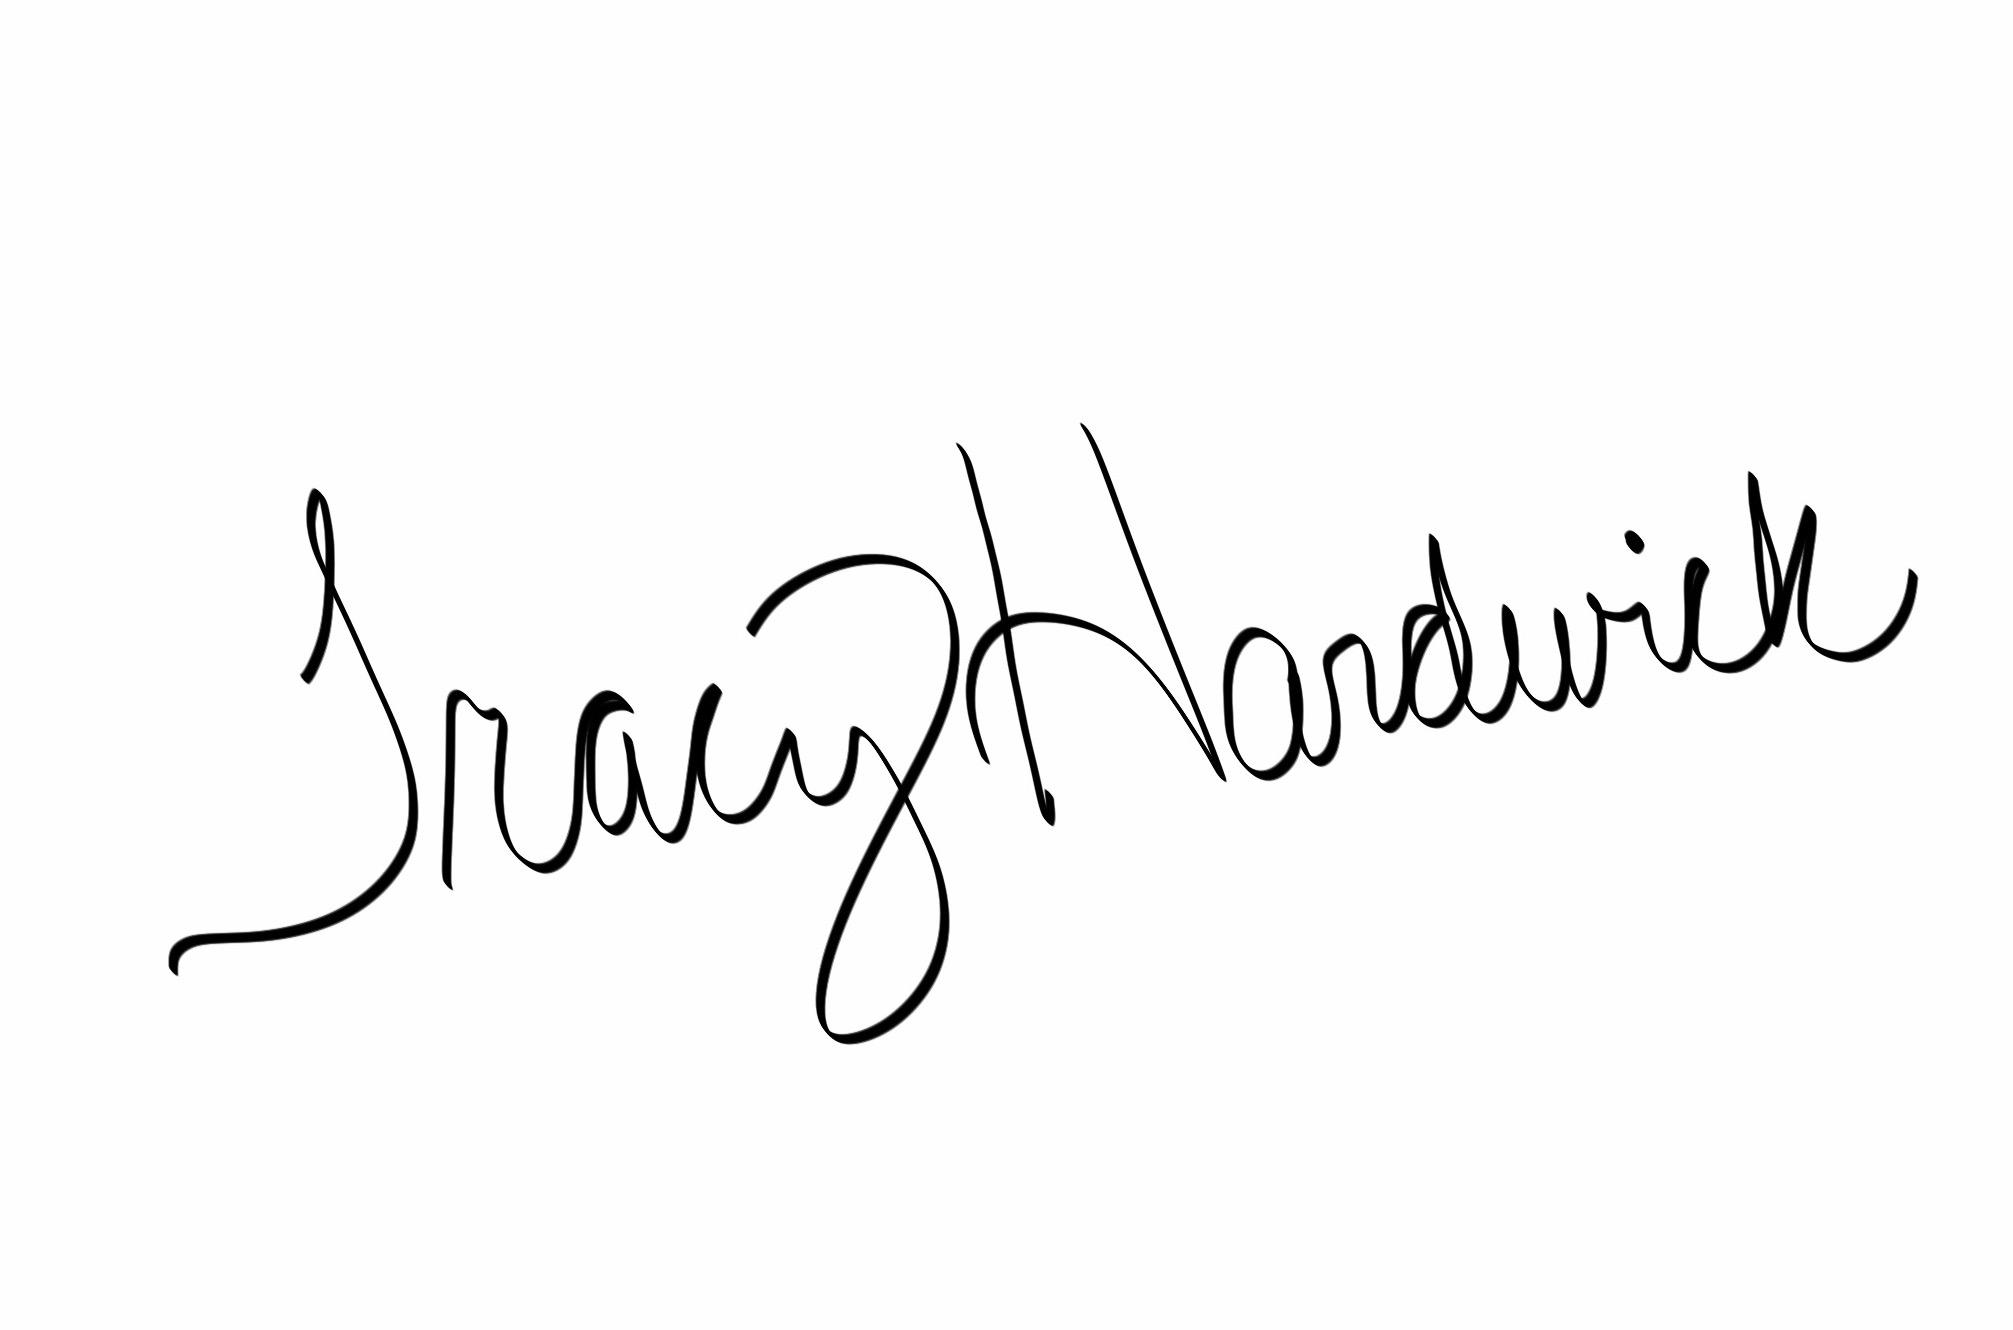 Tracy Hardwick's Signature